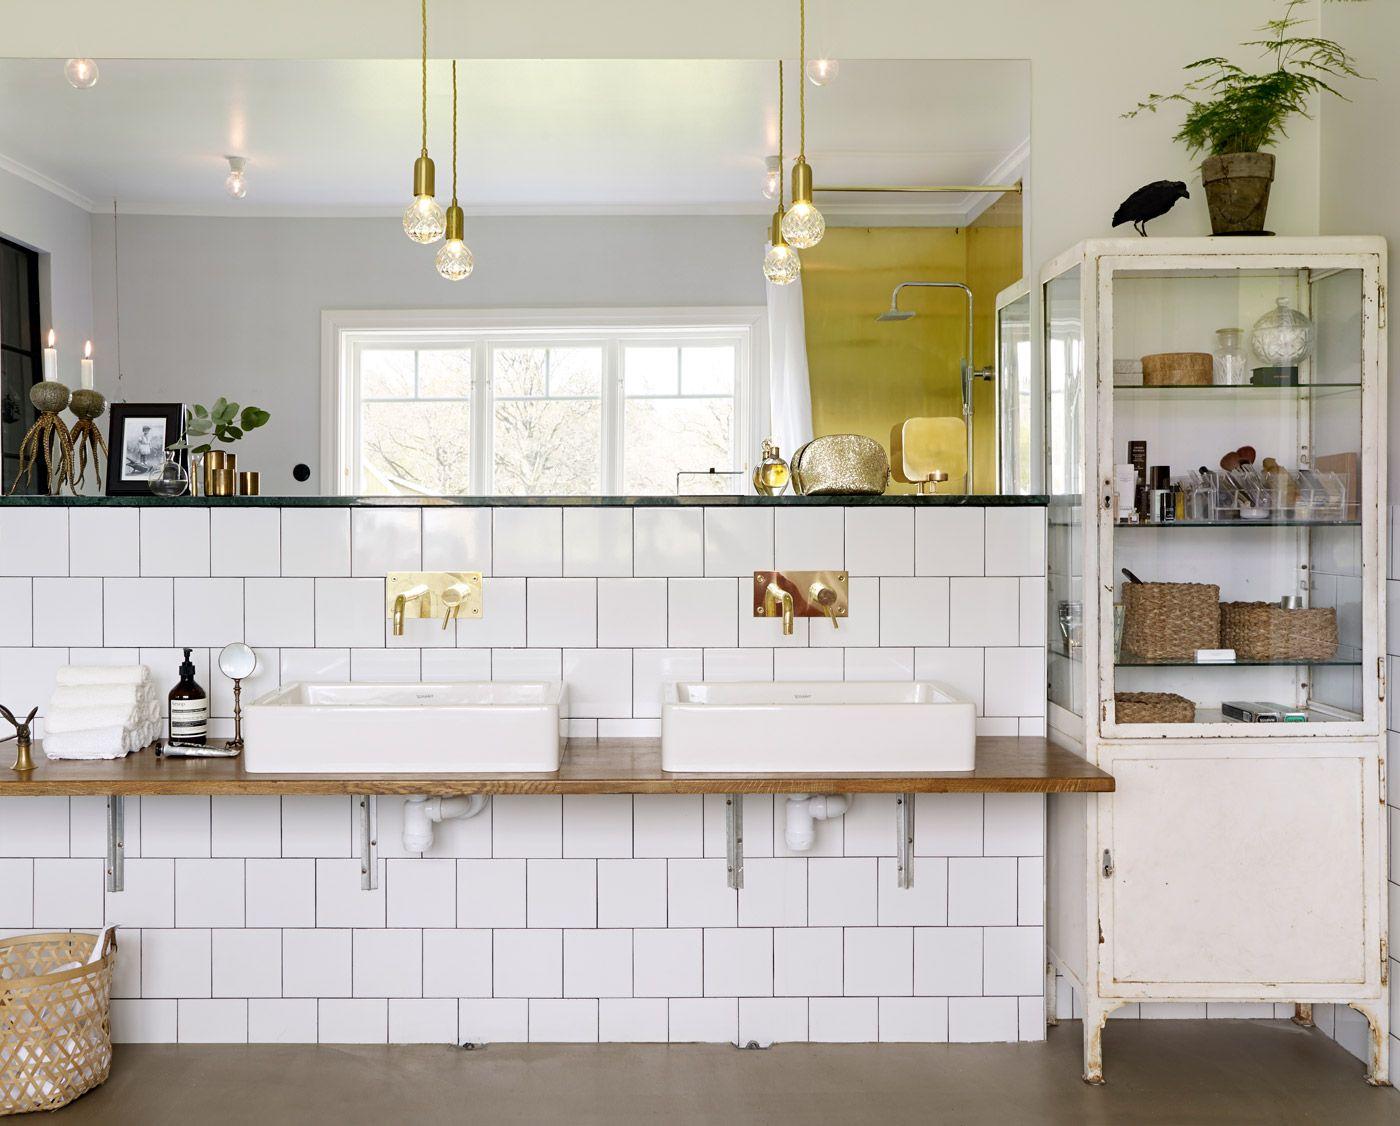 Hotellyxigt badrum u2013 badrumsinredning i mässing och grön marmor Bath room, Bath and Room